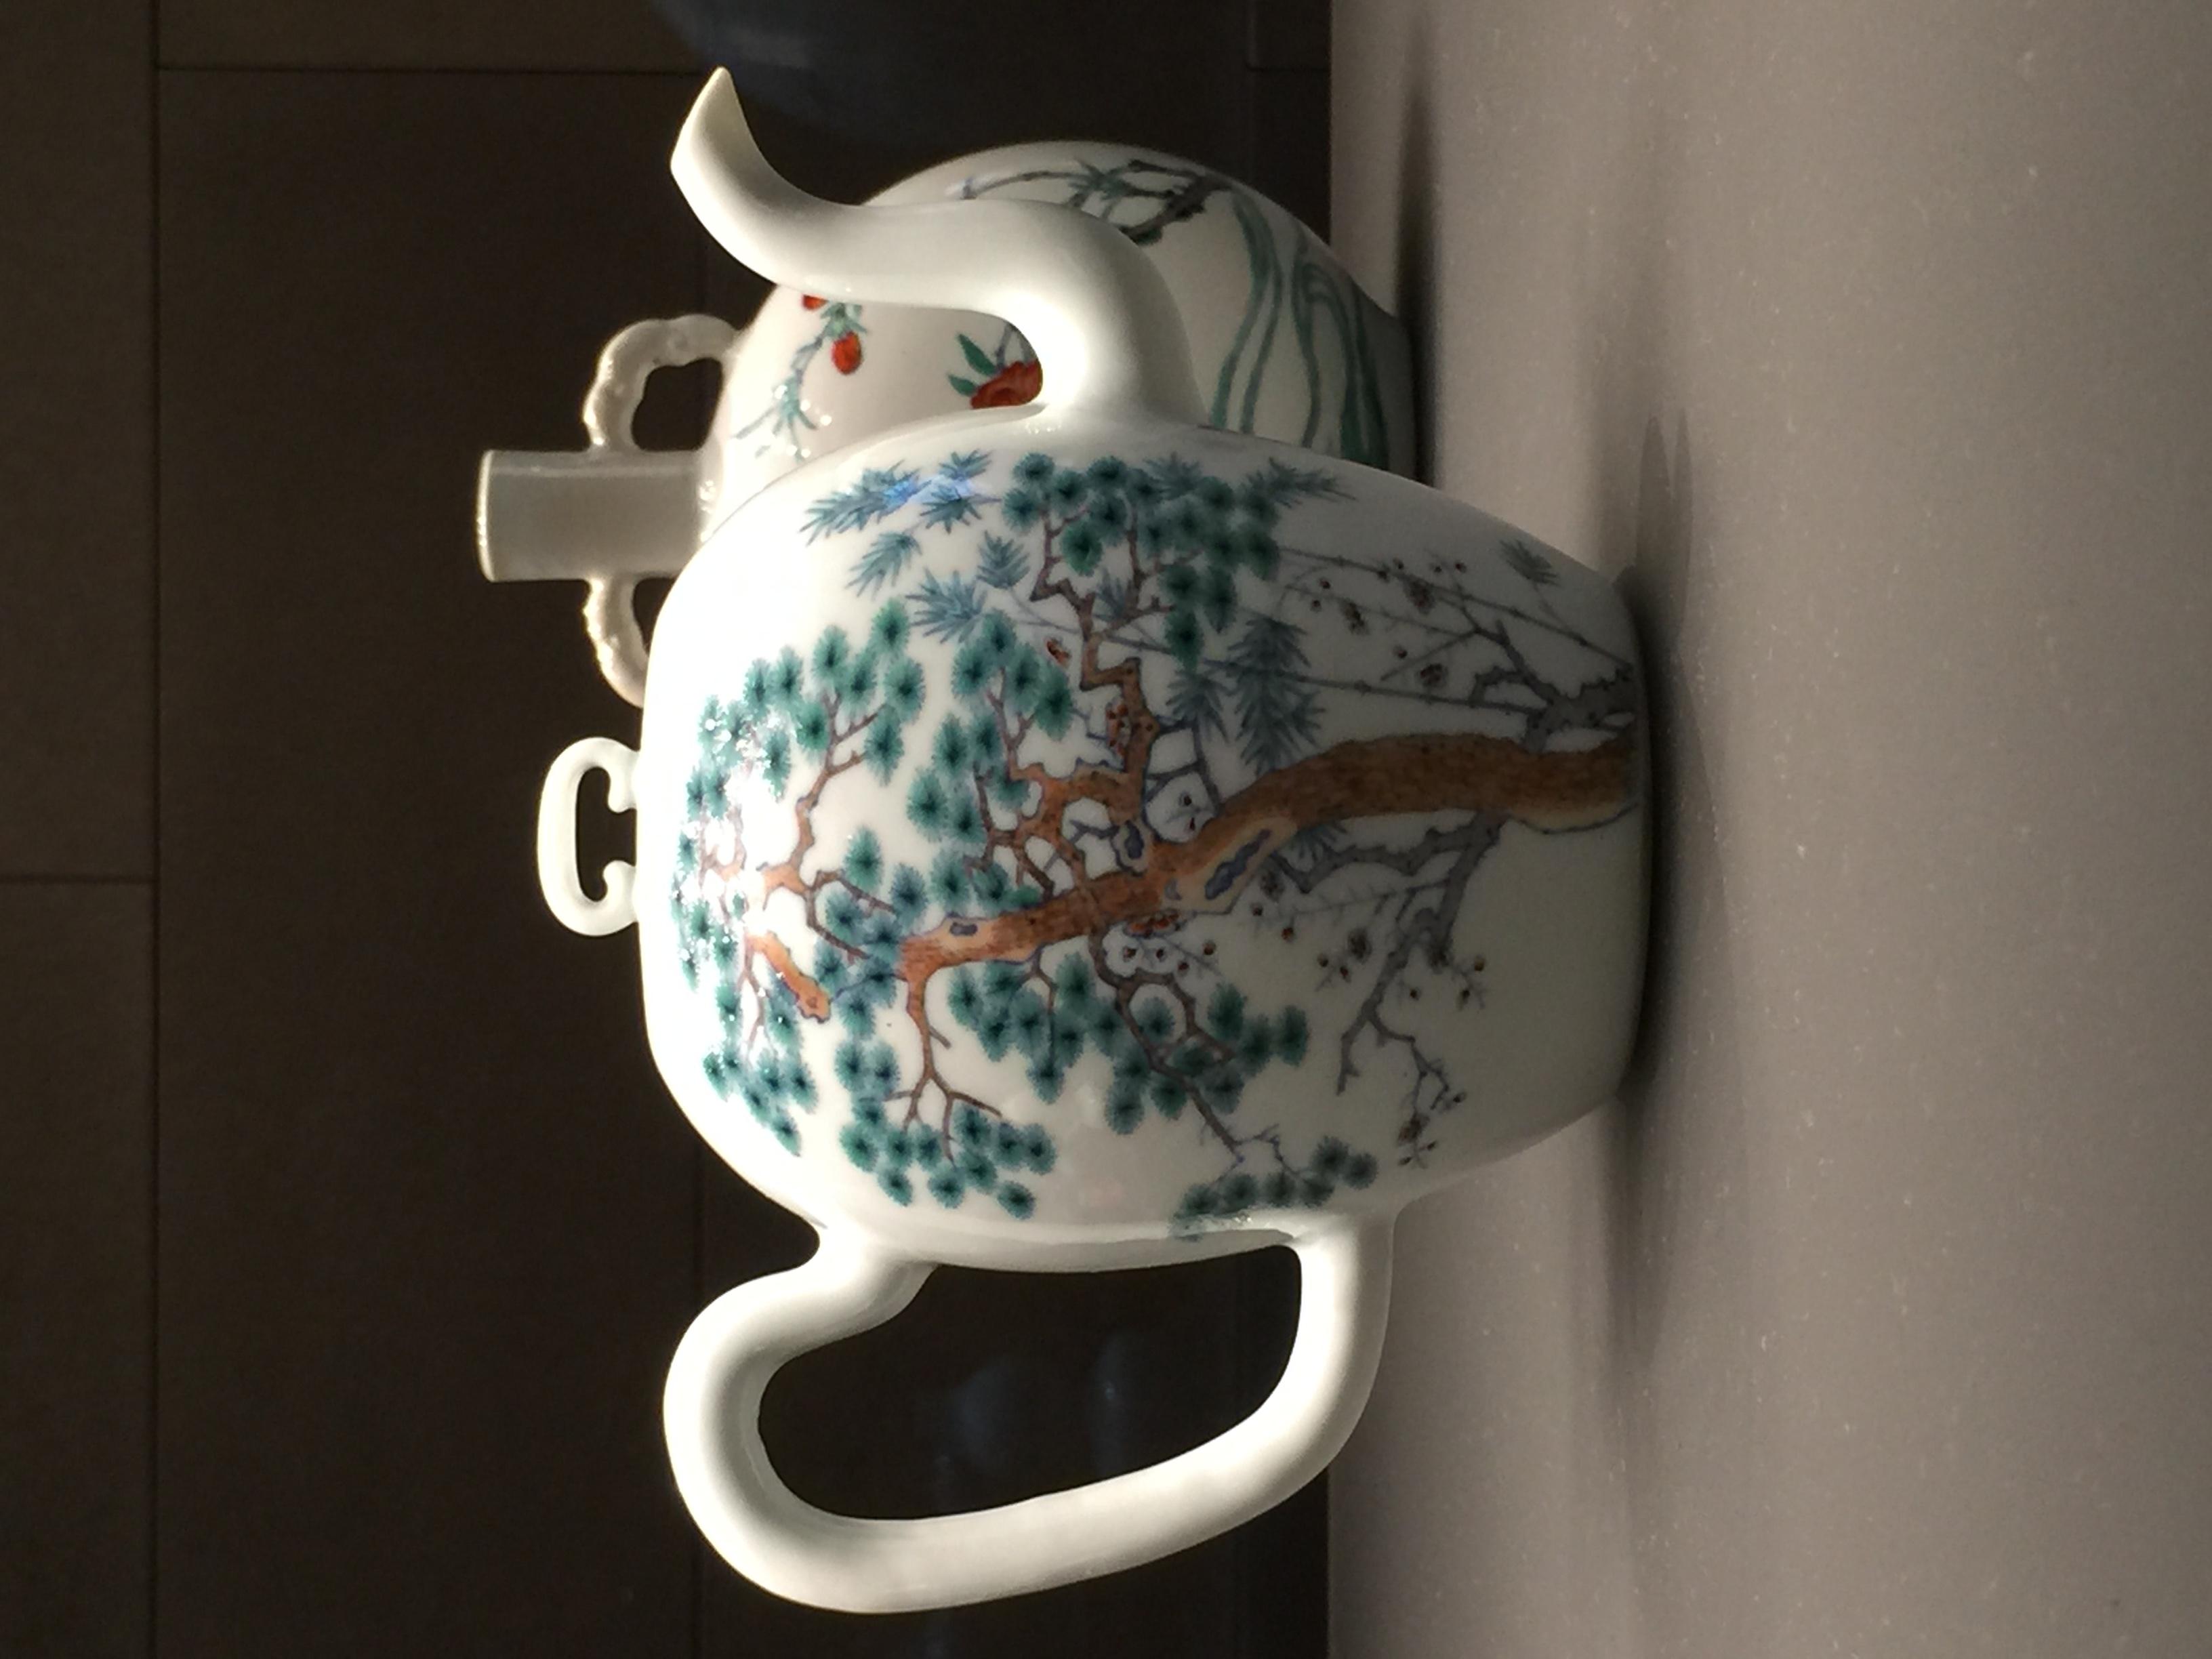 Chinese-Porcelain-British-Museum-Percival-David-jessewaugh.com-110.jpg